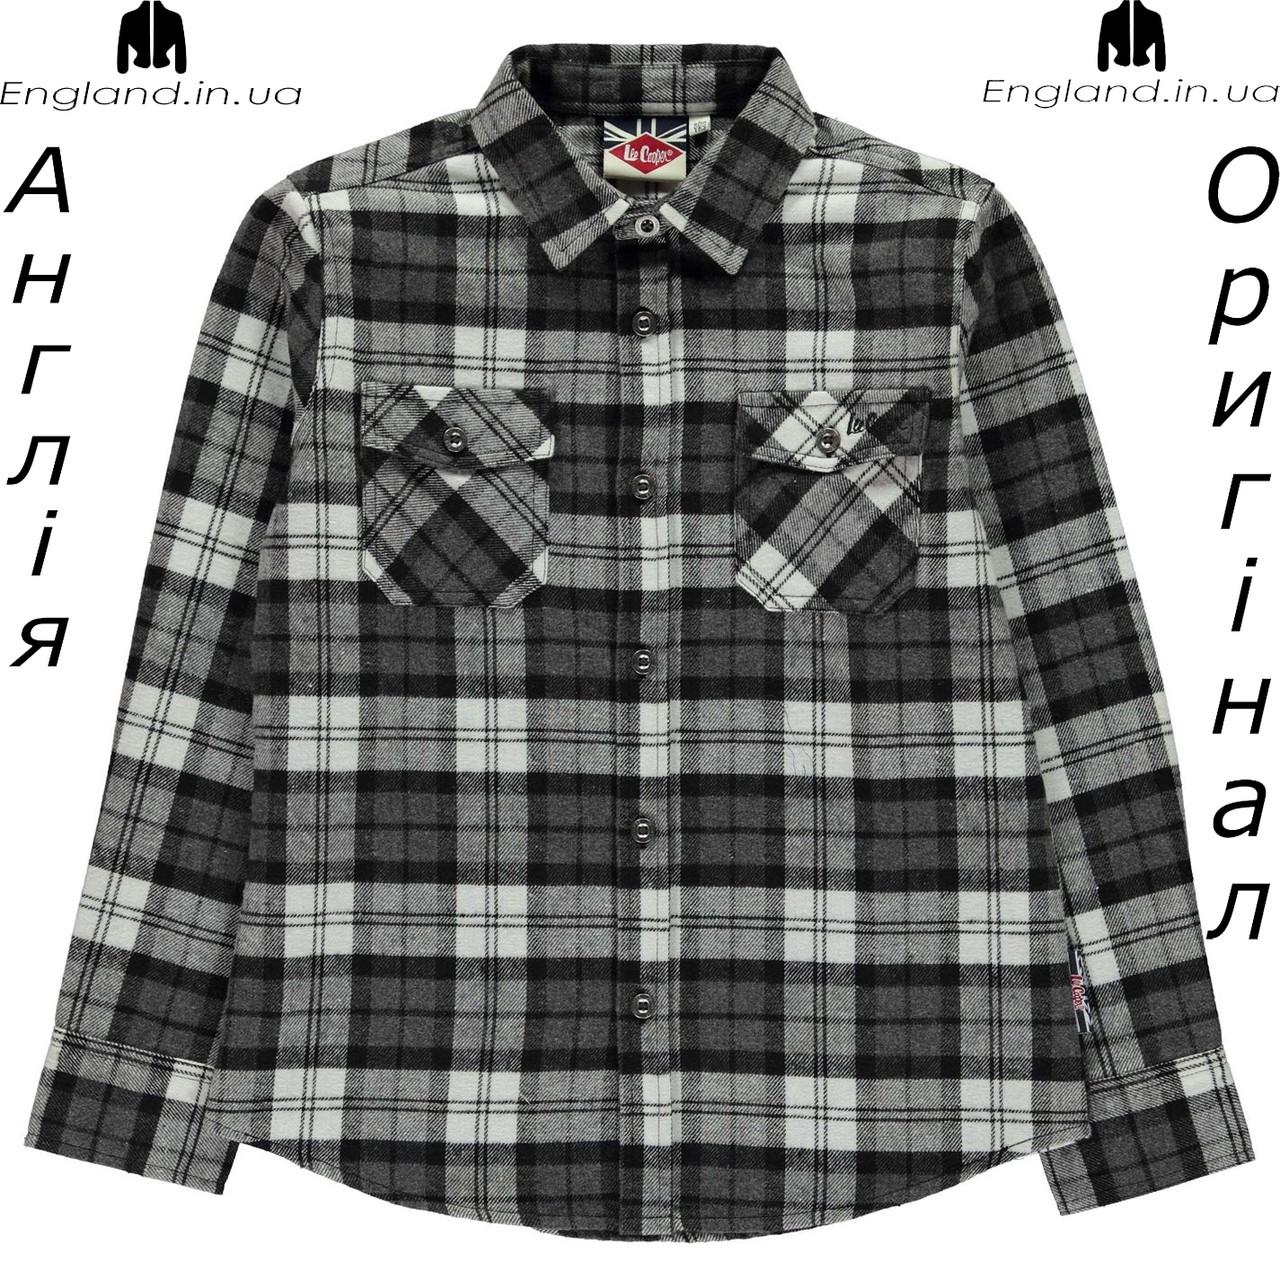 Рубашка Lee Cooper из Англии для мальчиков 2-14 лет - фланелева